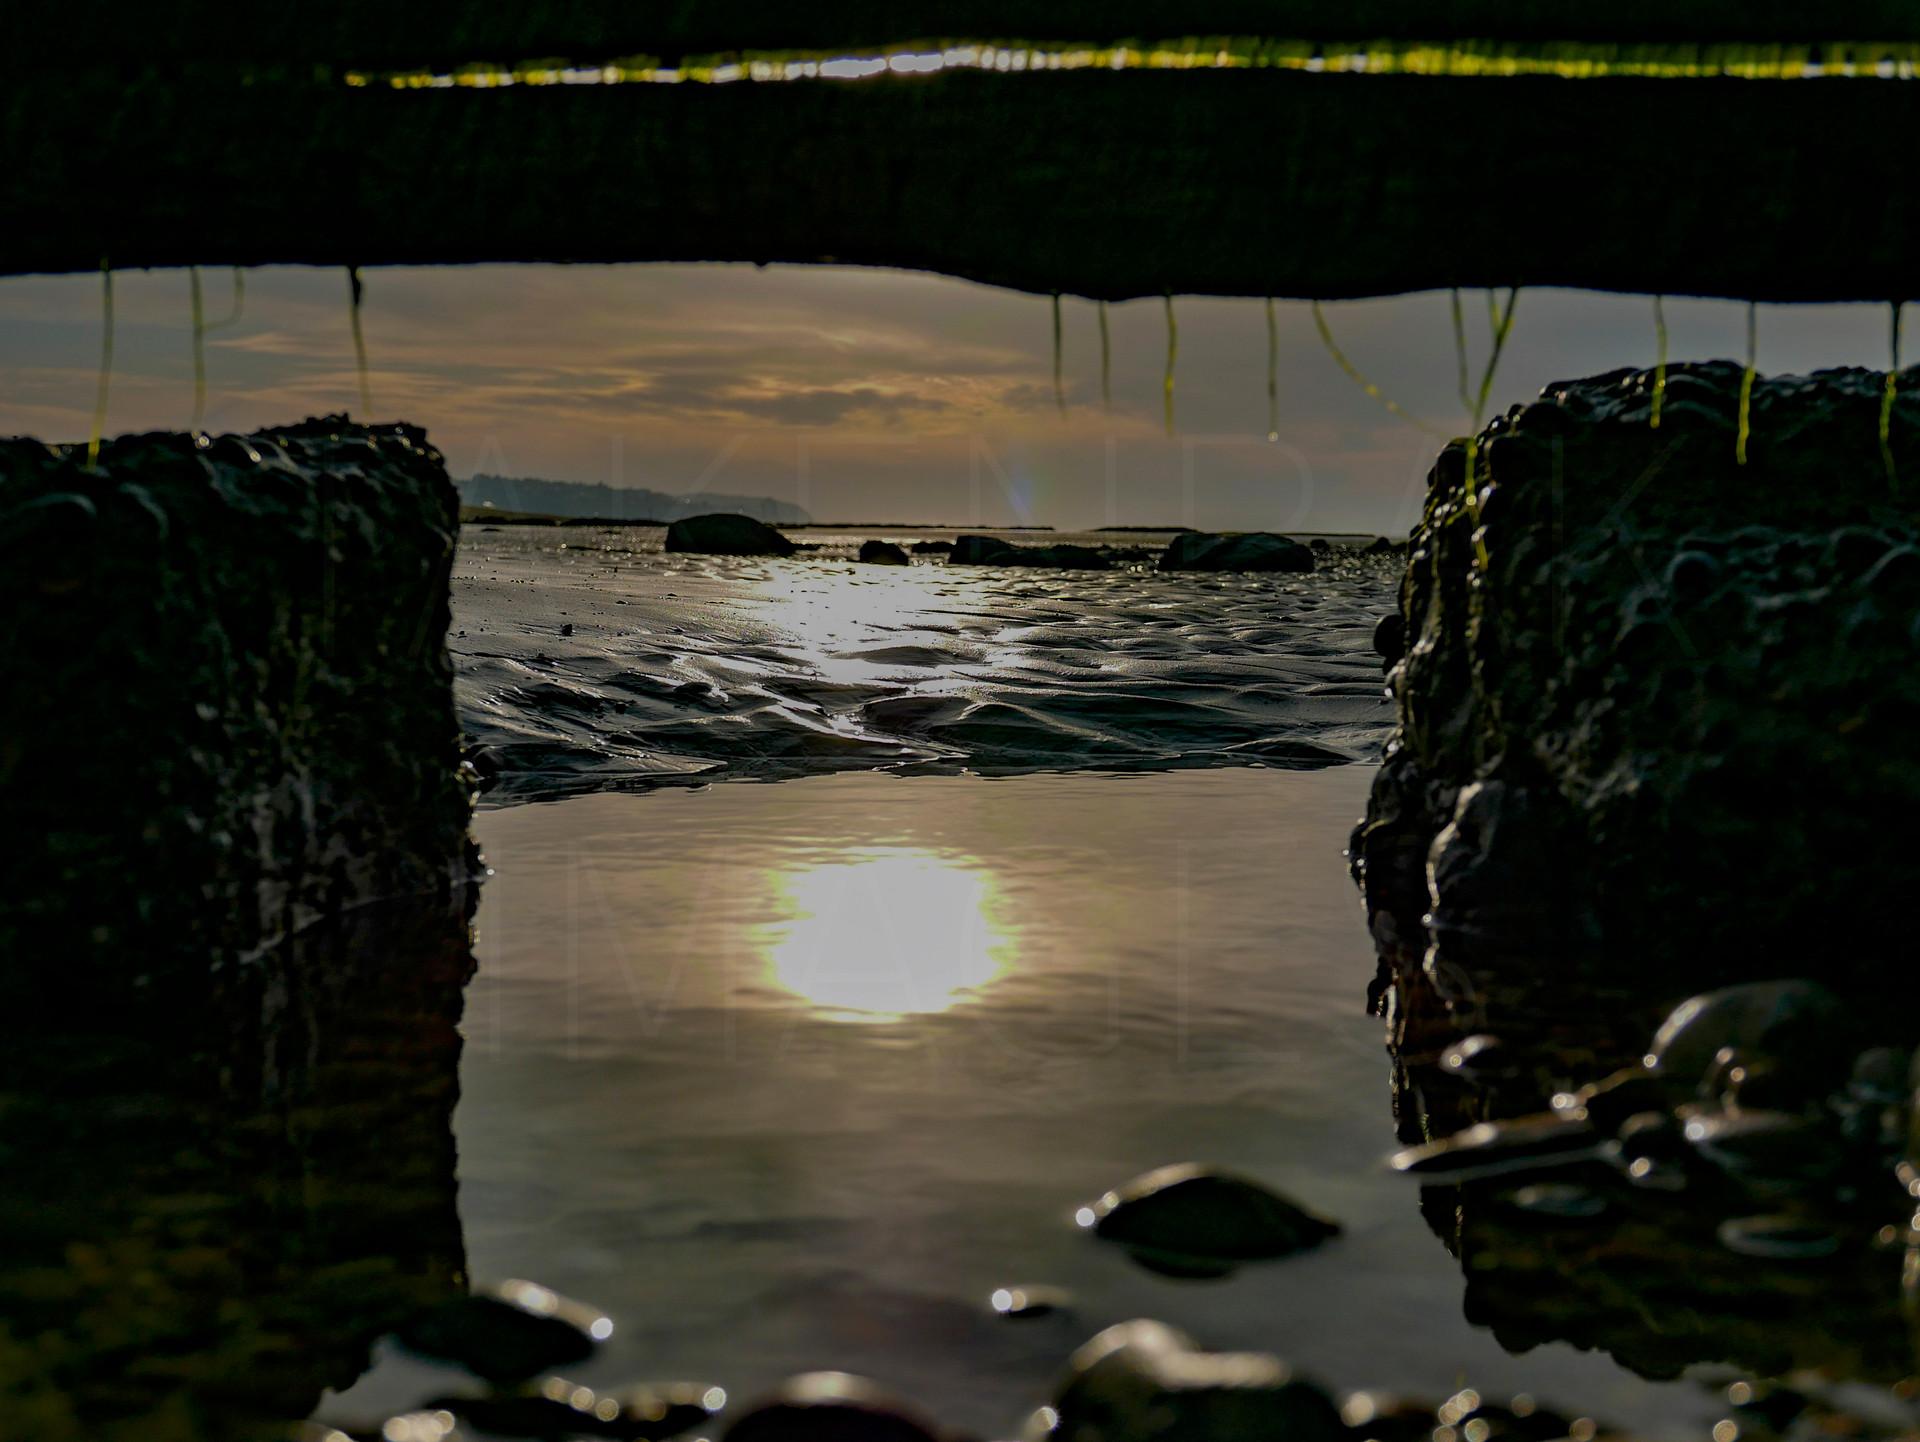 Sunrise and Groynes